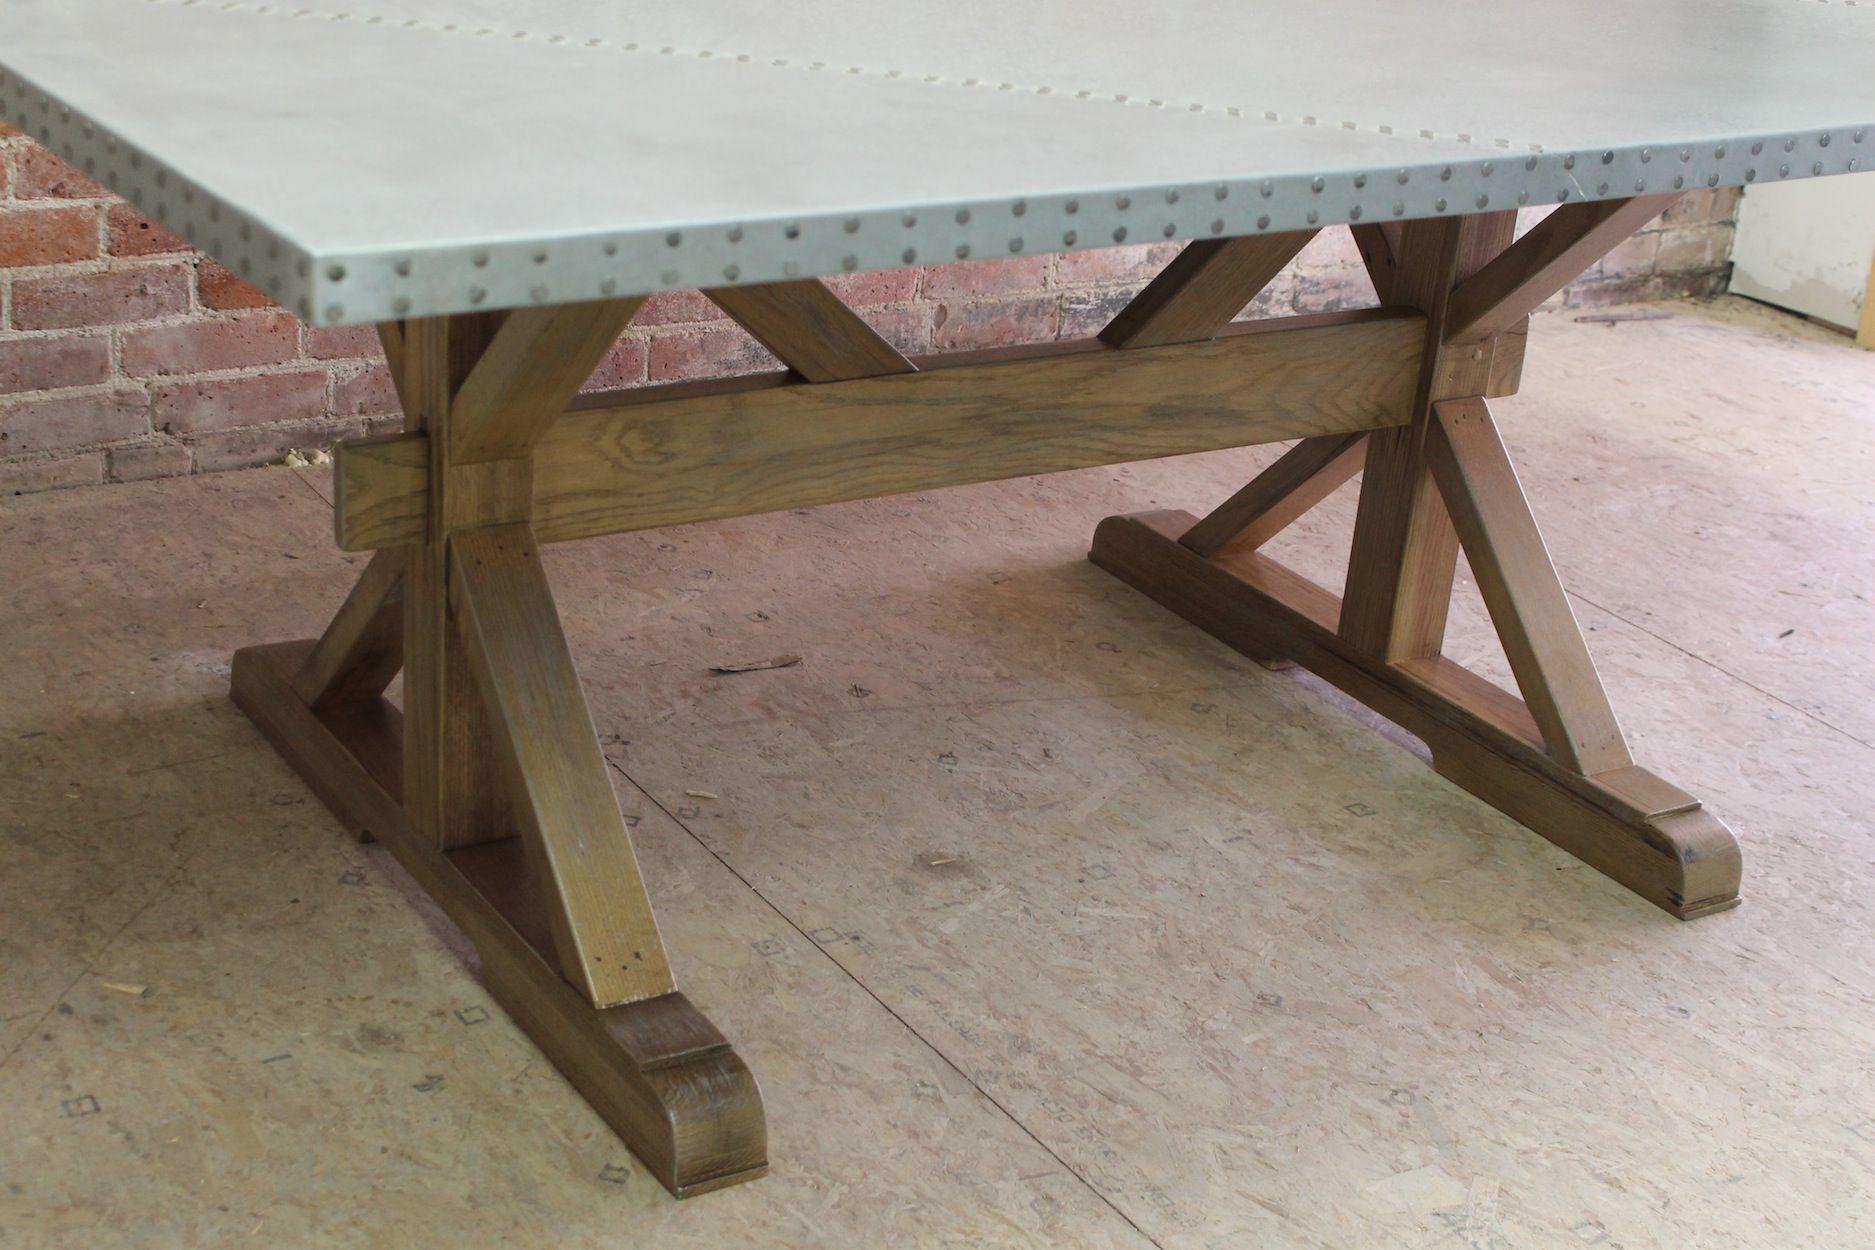 Zinc Top Farm Table With X Trestle Base Zinc Table Zinc Table Top Farm Table